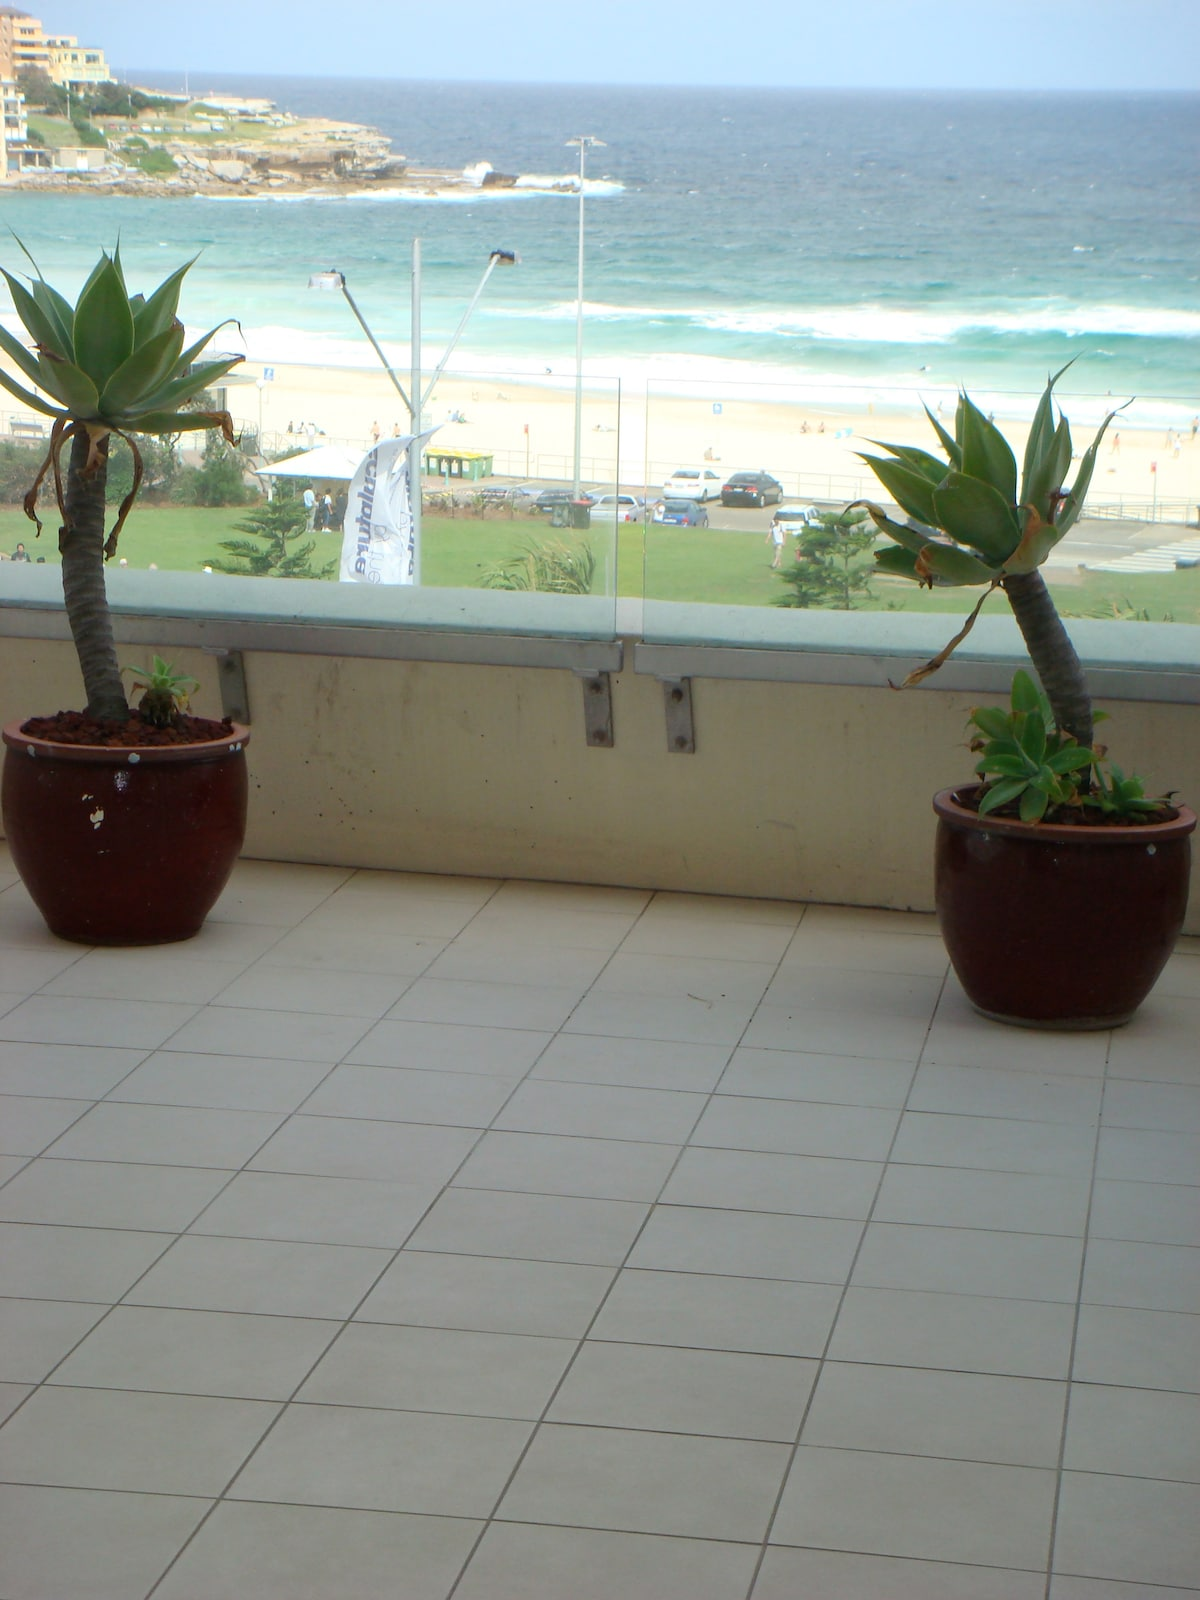 Jan from Bondi Beach